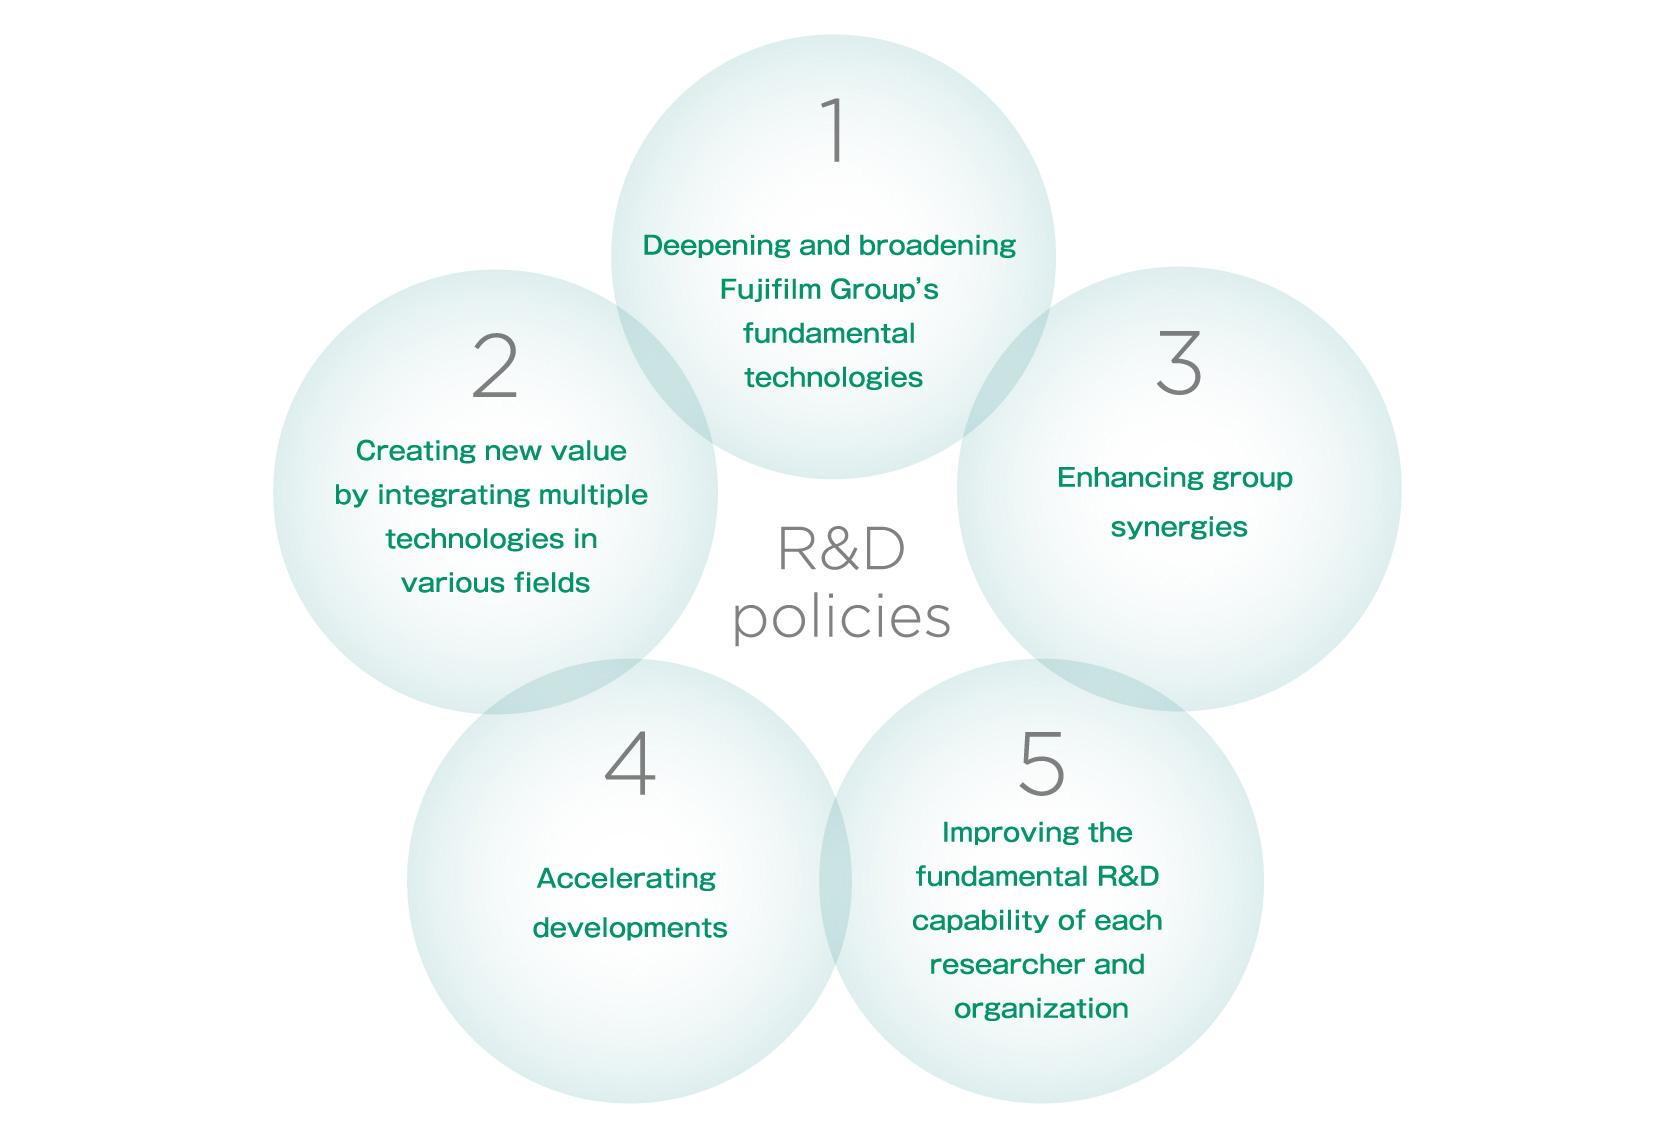 [image] R&D Policies